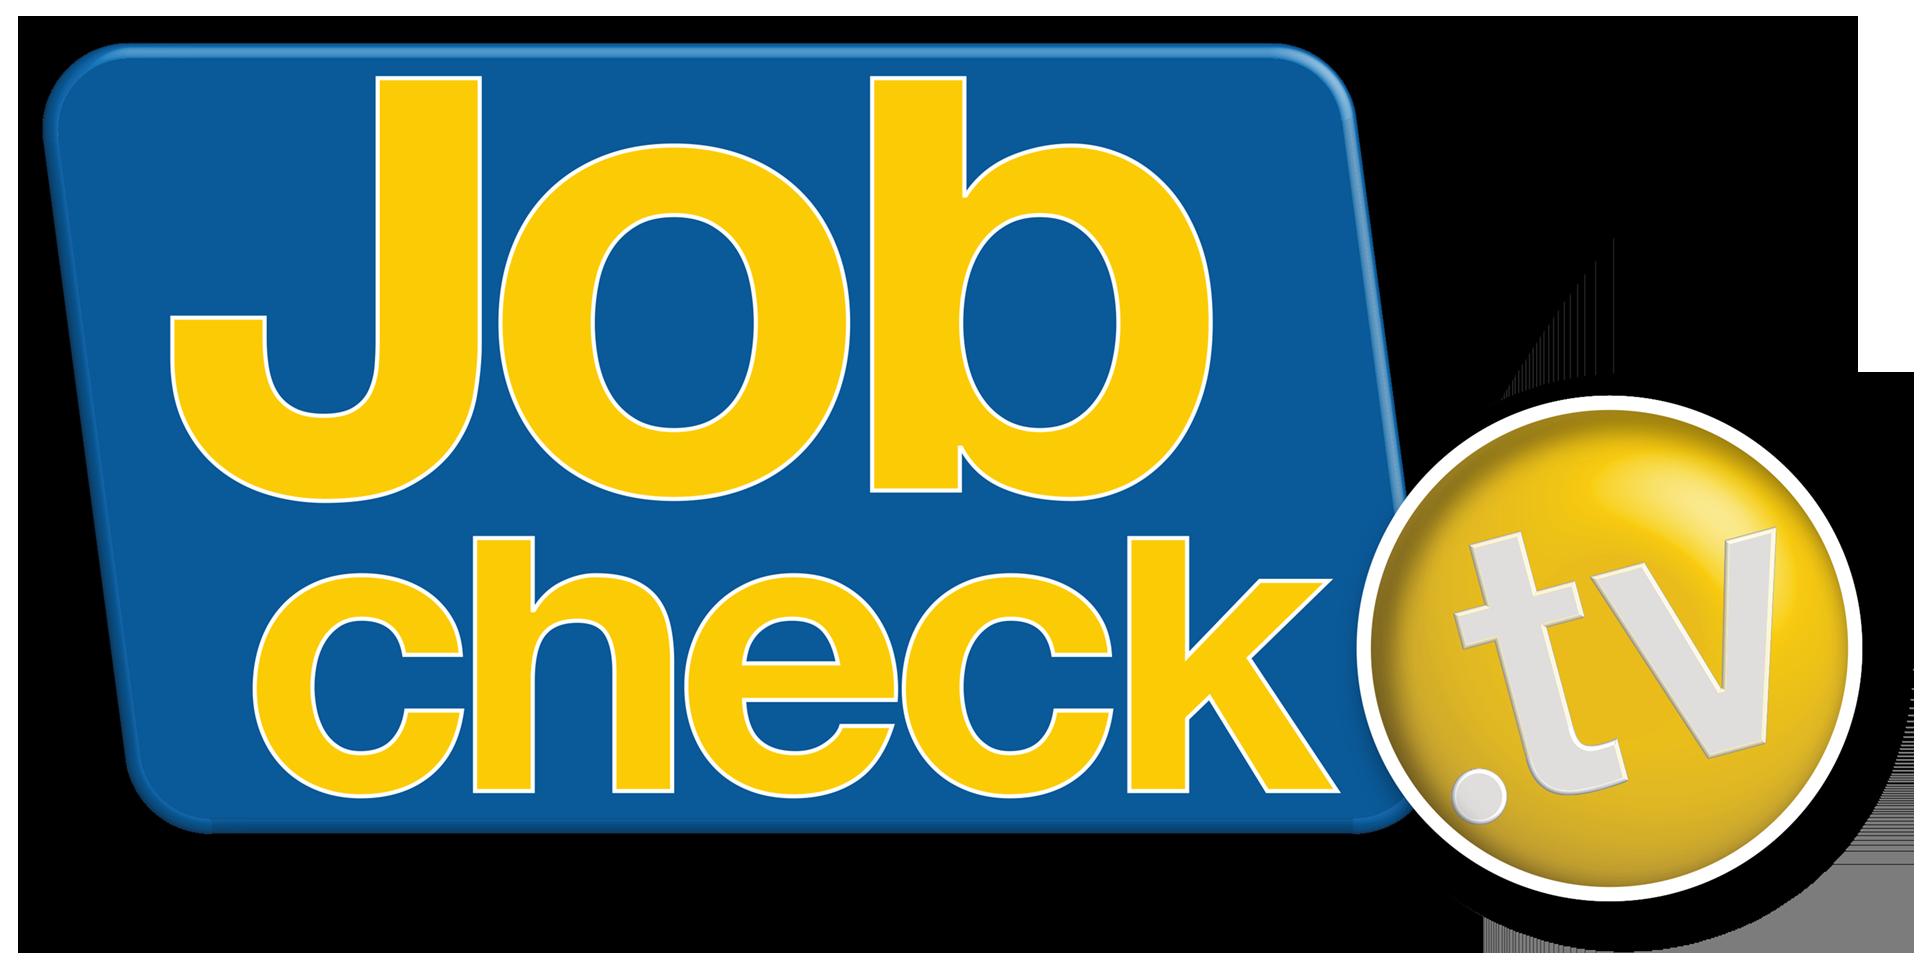 JobCheck.tv